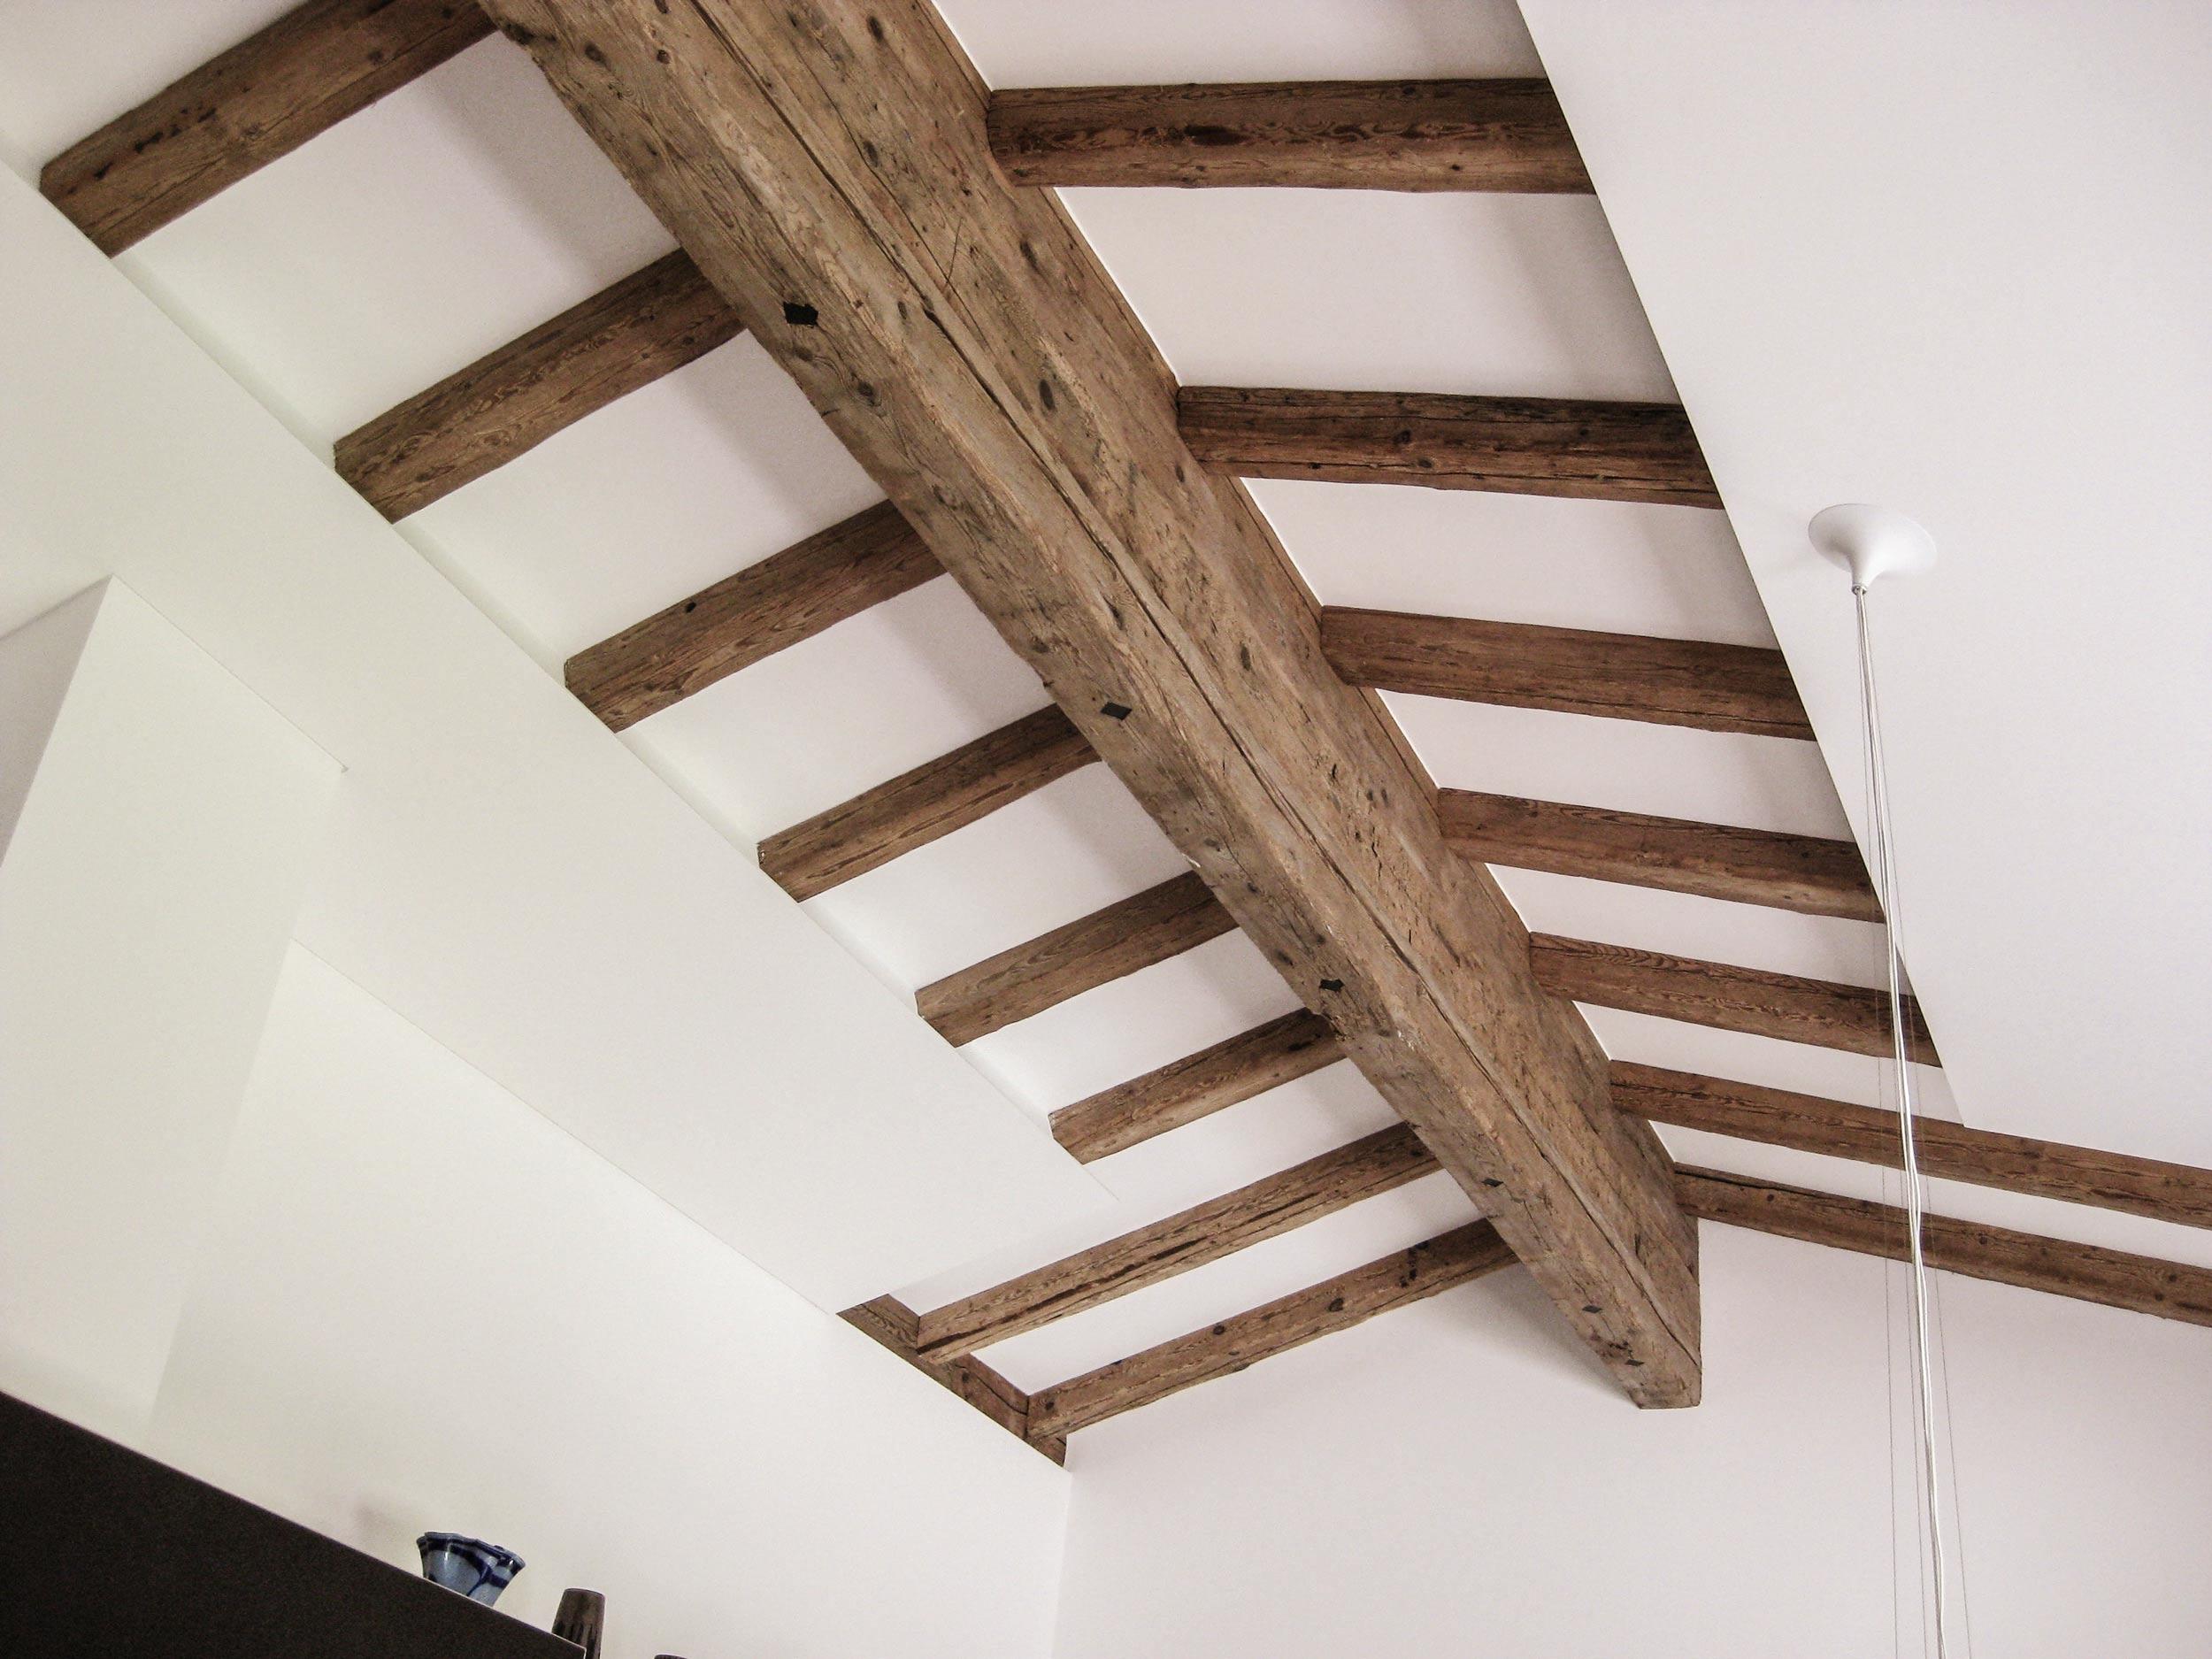 zimmerei-stoib-holzbau-holzhaus-innenausbau-altholz-treppe-dachstuhl-dachgeschoss-03.jpg